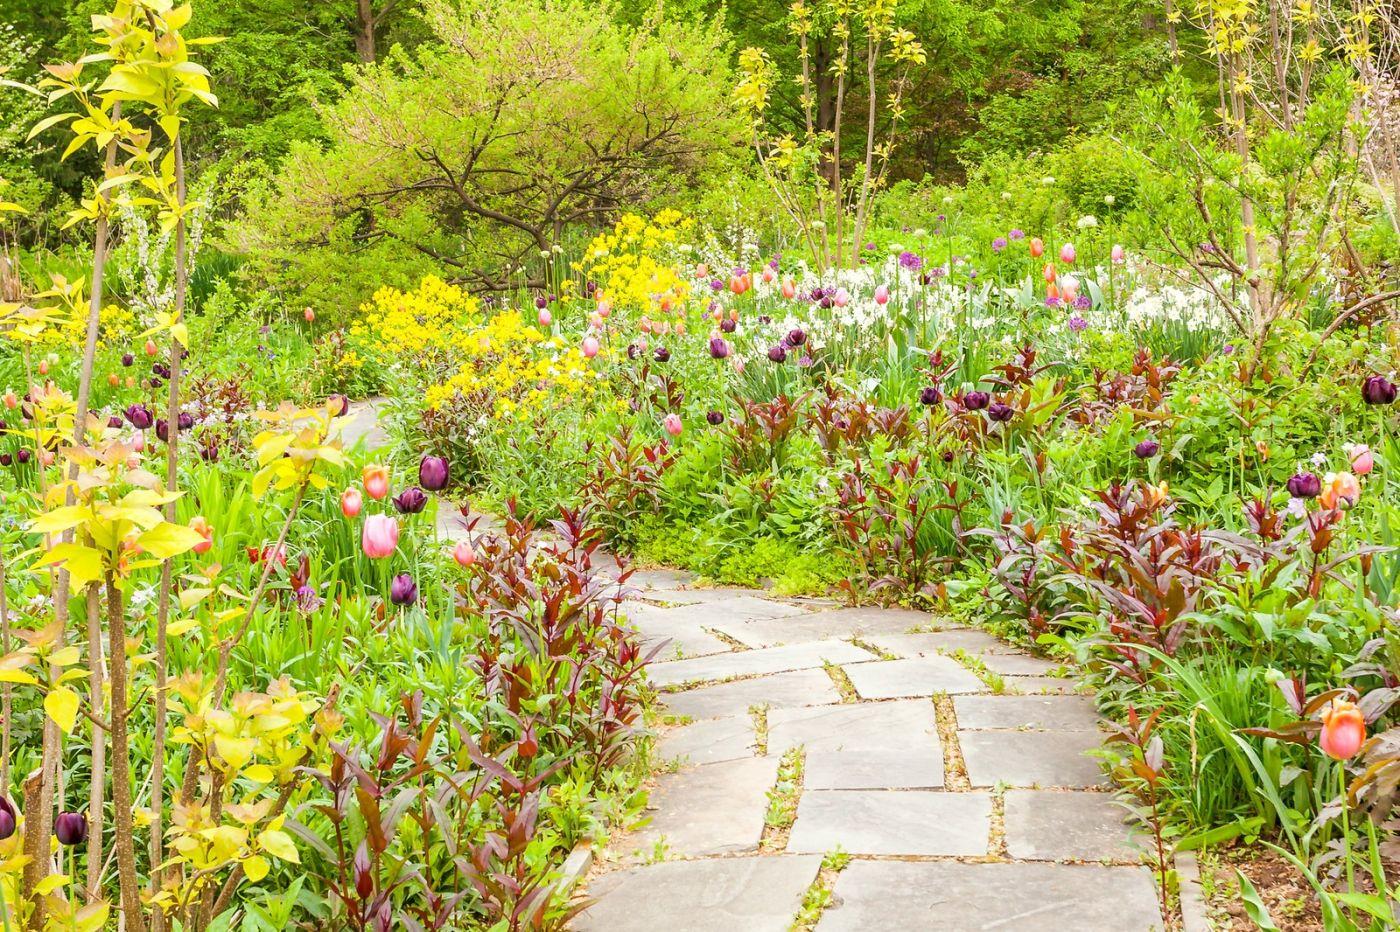 Chanticleer花园,融入自然_图1-29